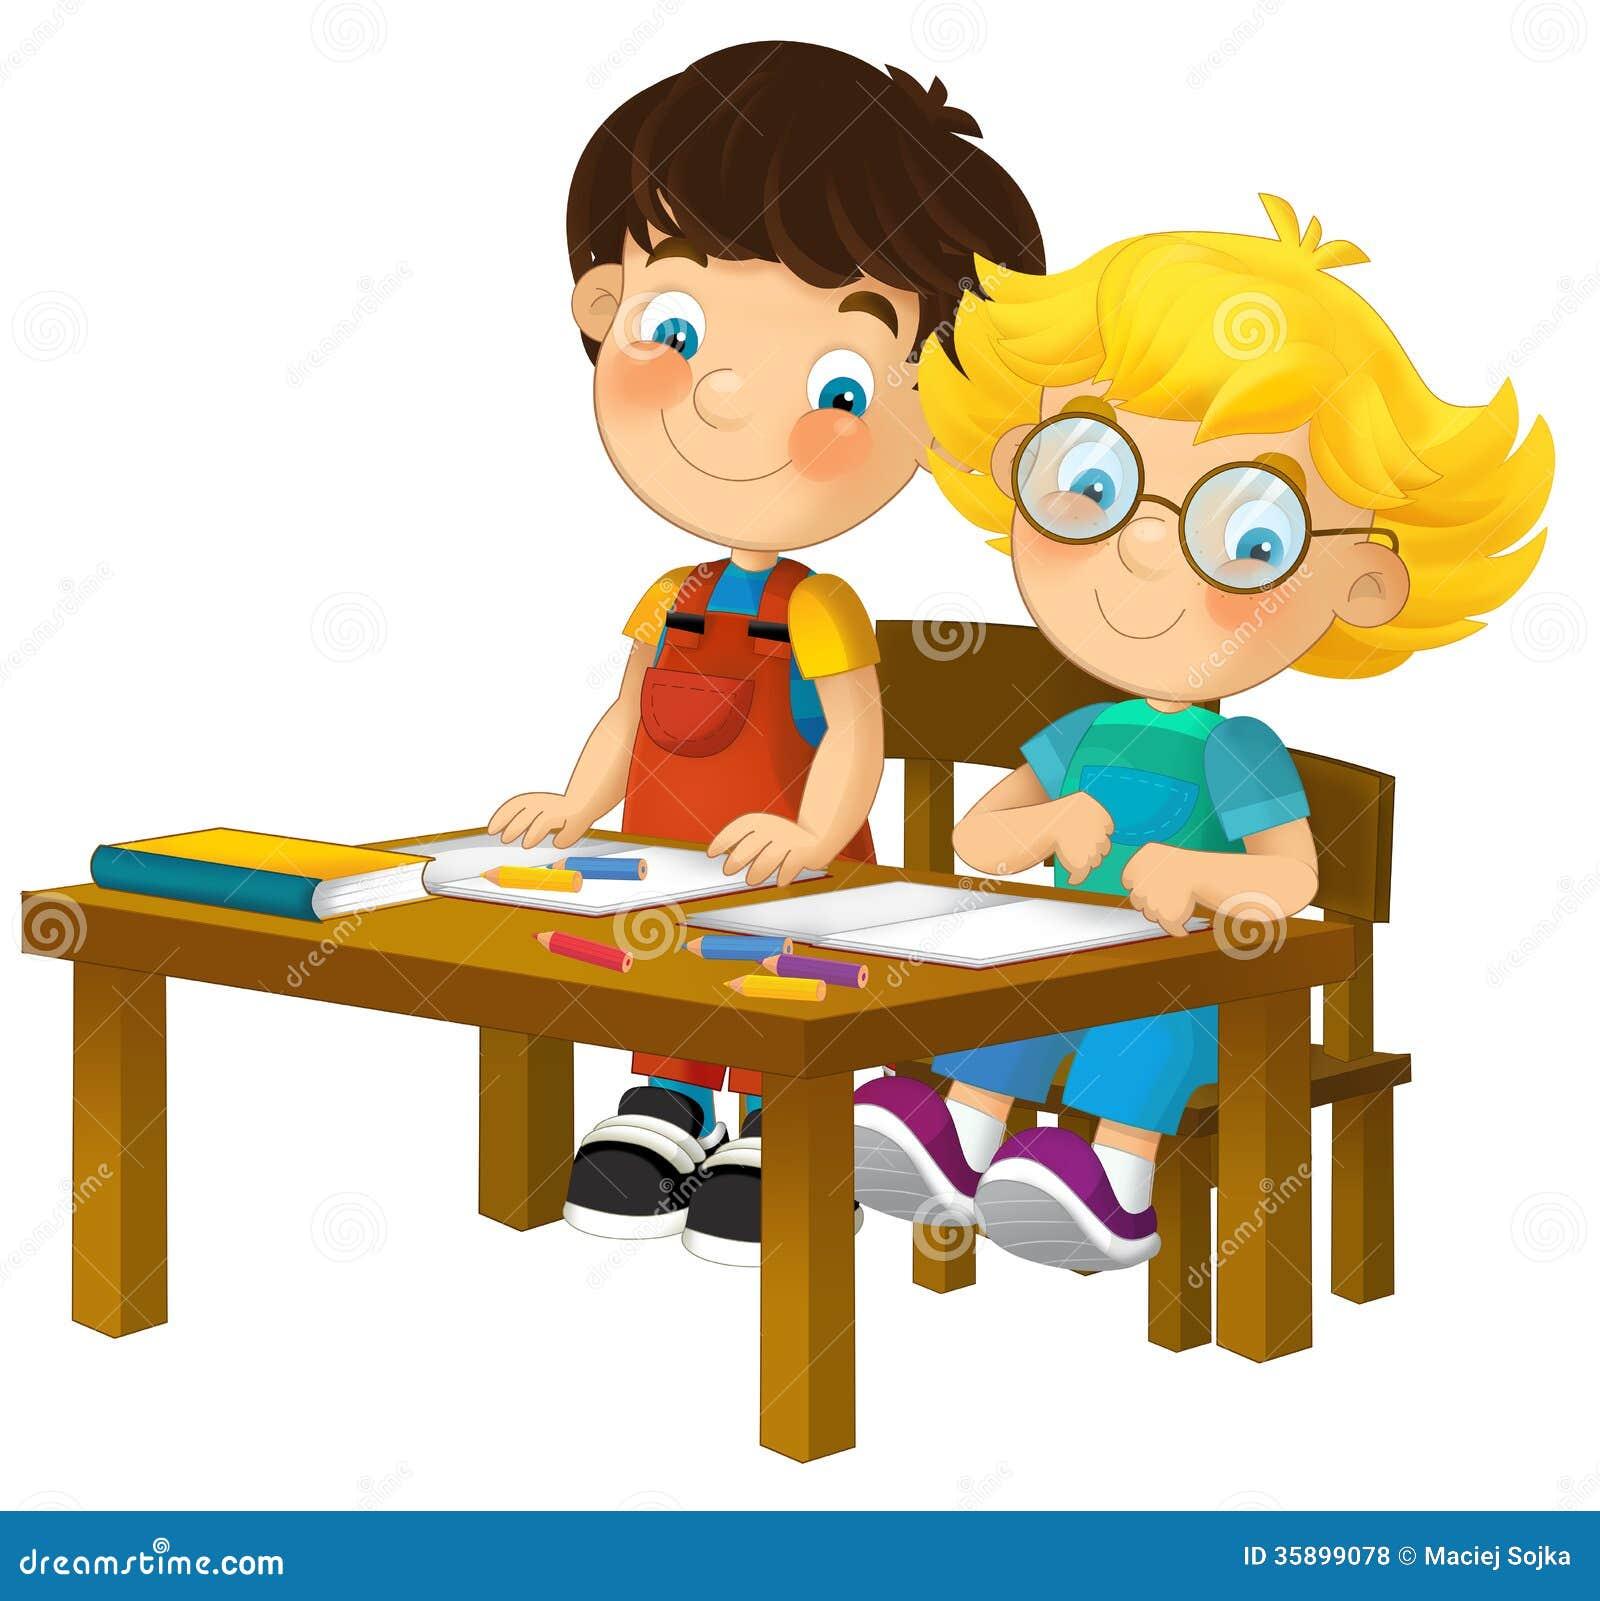 Cartoon Children Sitting Learning Illustration For The